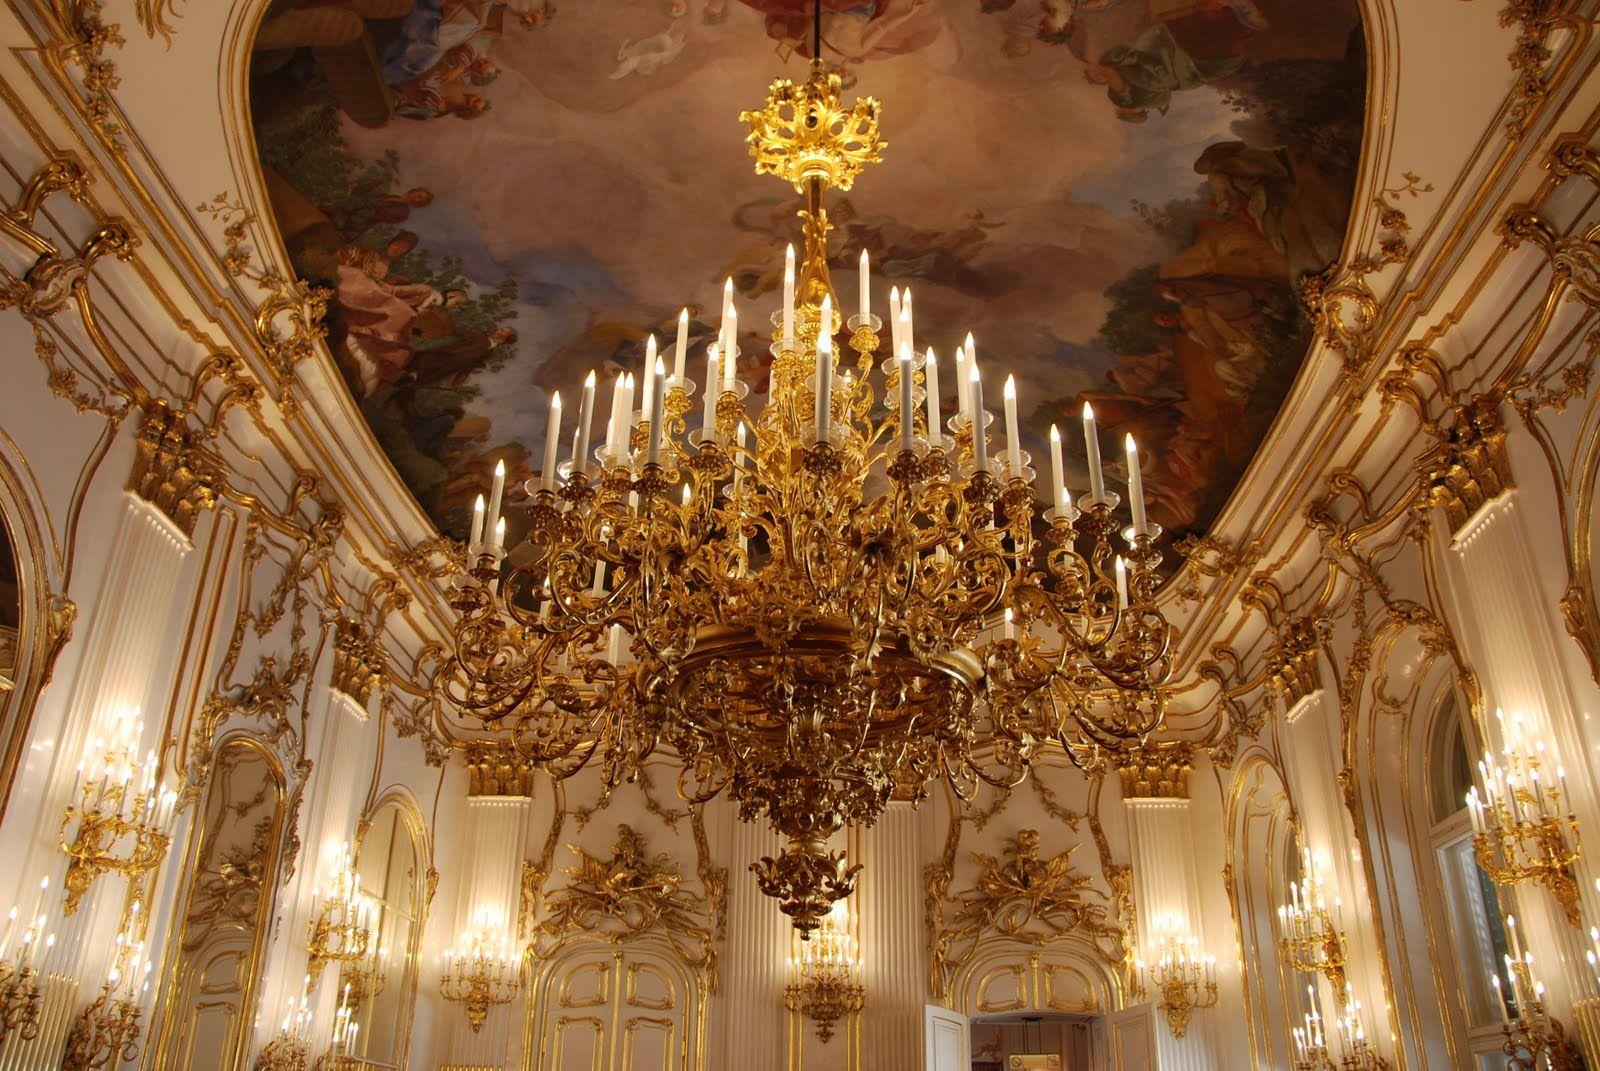 Schönbrunn Palace (1744-1749, Vienna, Austria